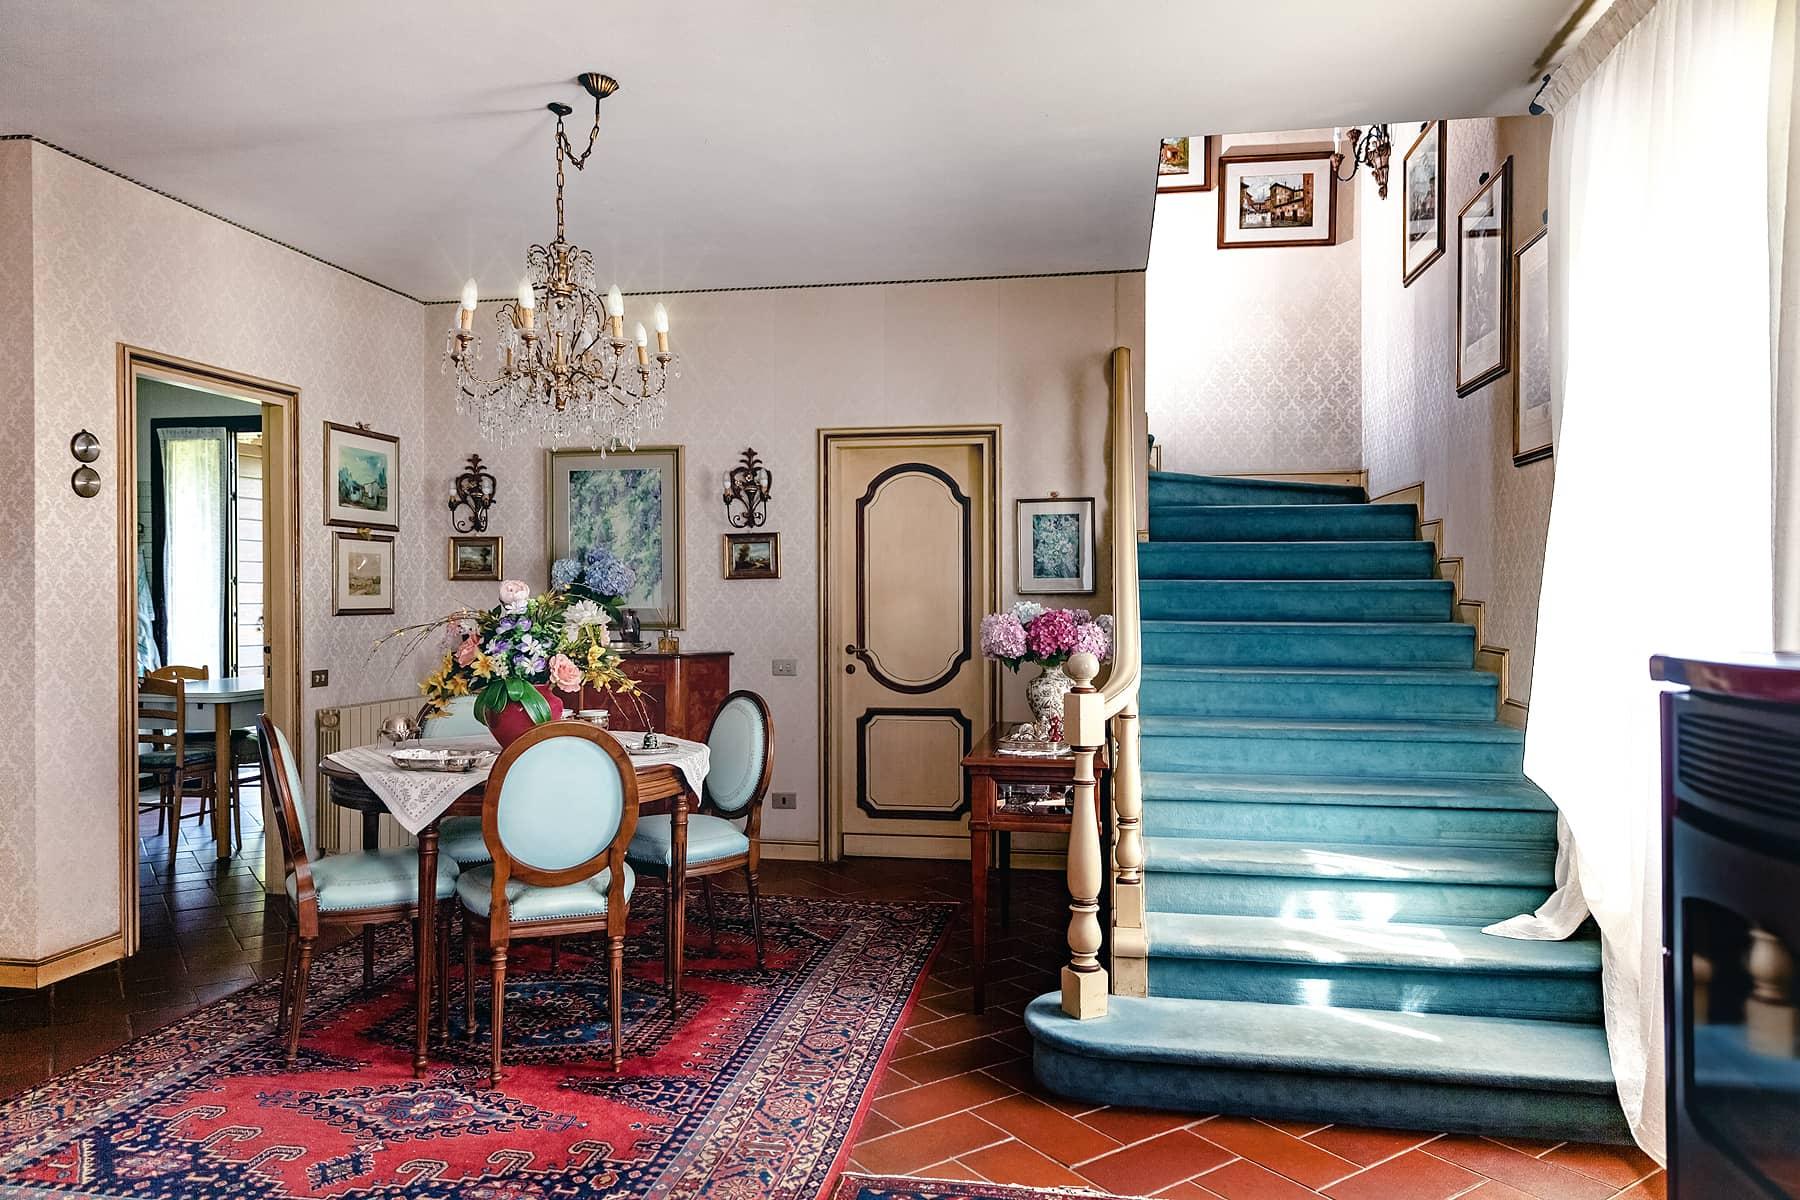 Villa in Vendita a Carbonera: 5 locali, 850 mq - Foto 9